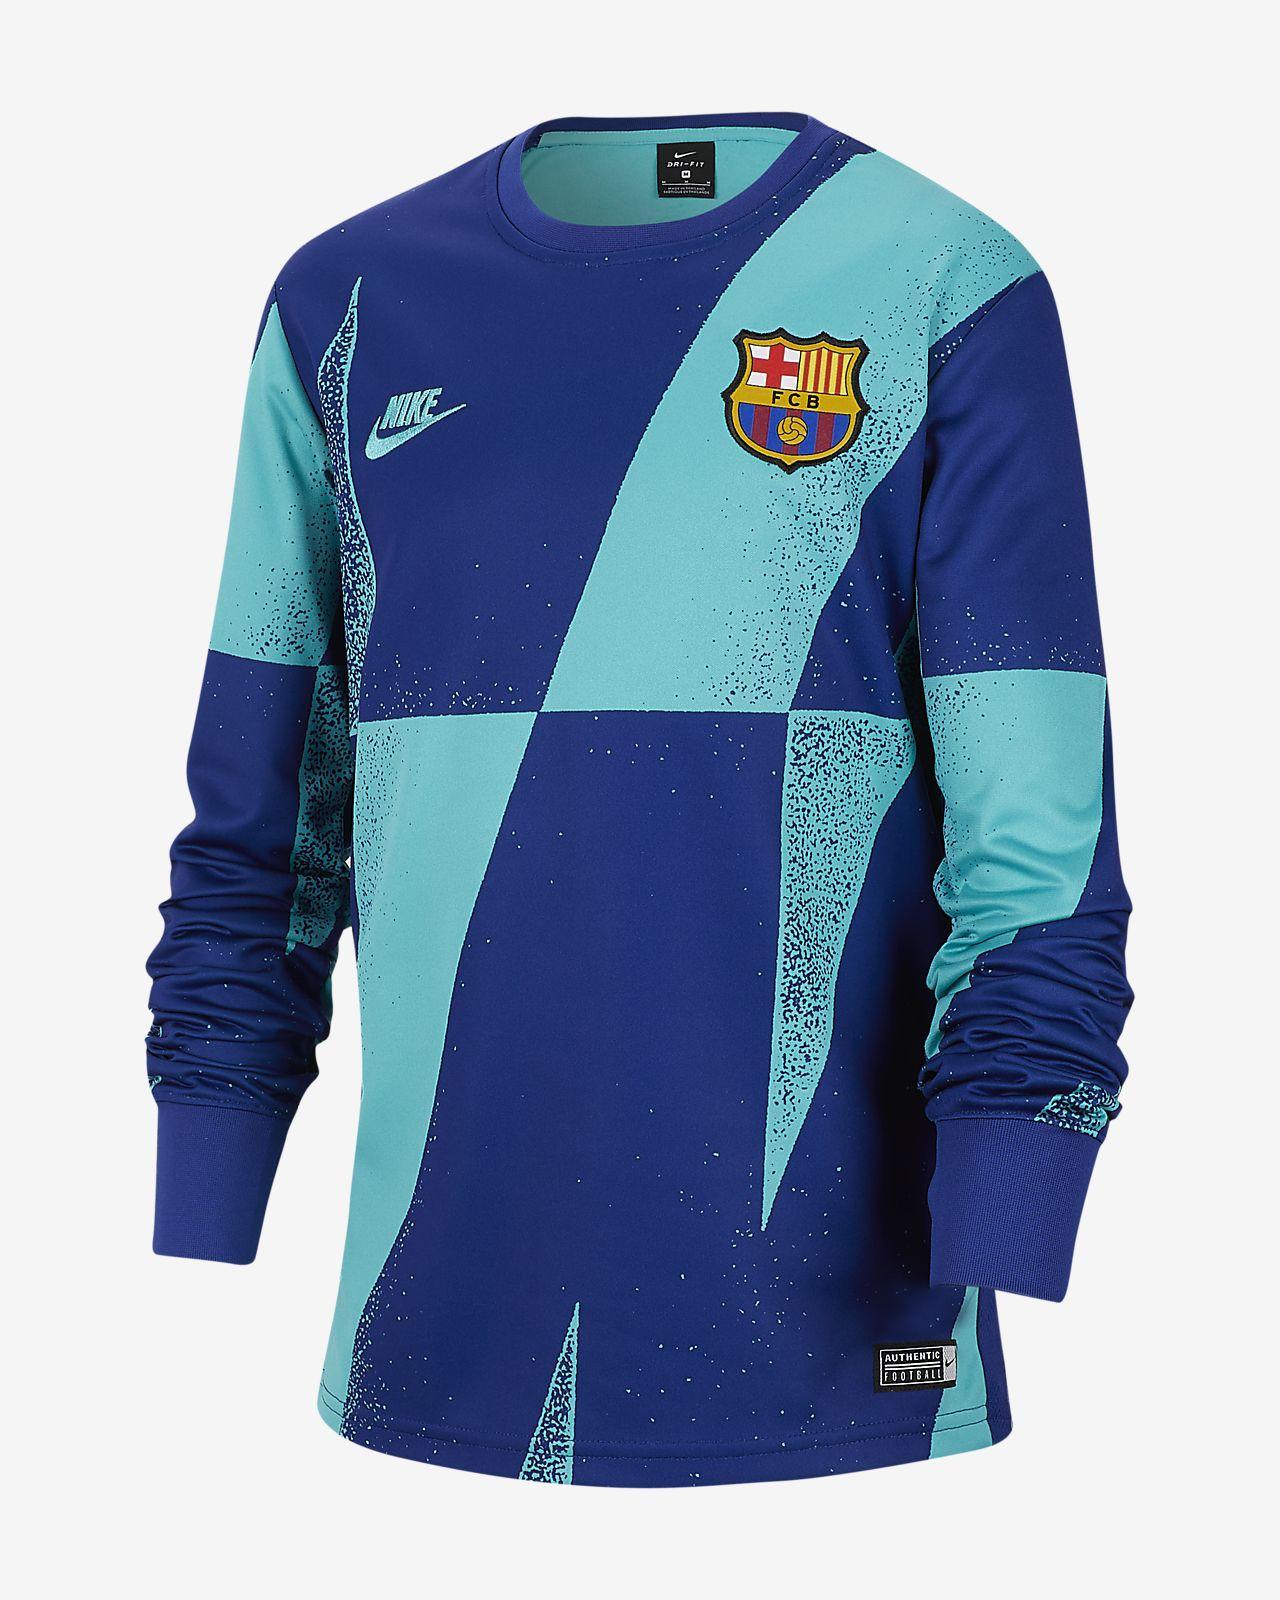 FC Barcelona Older Kids' Football Top